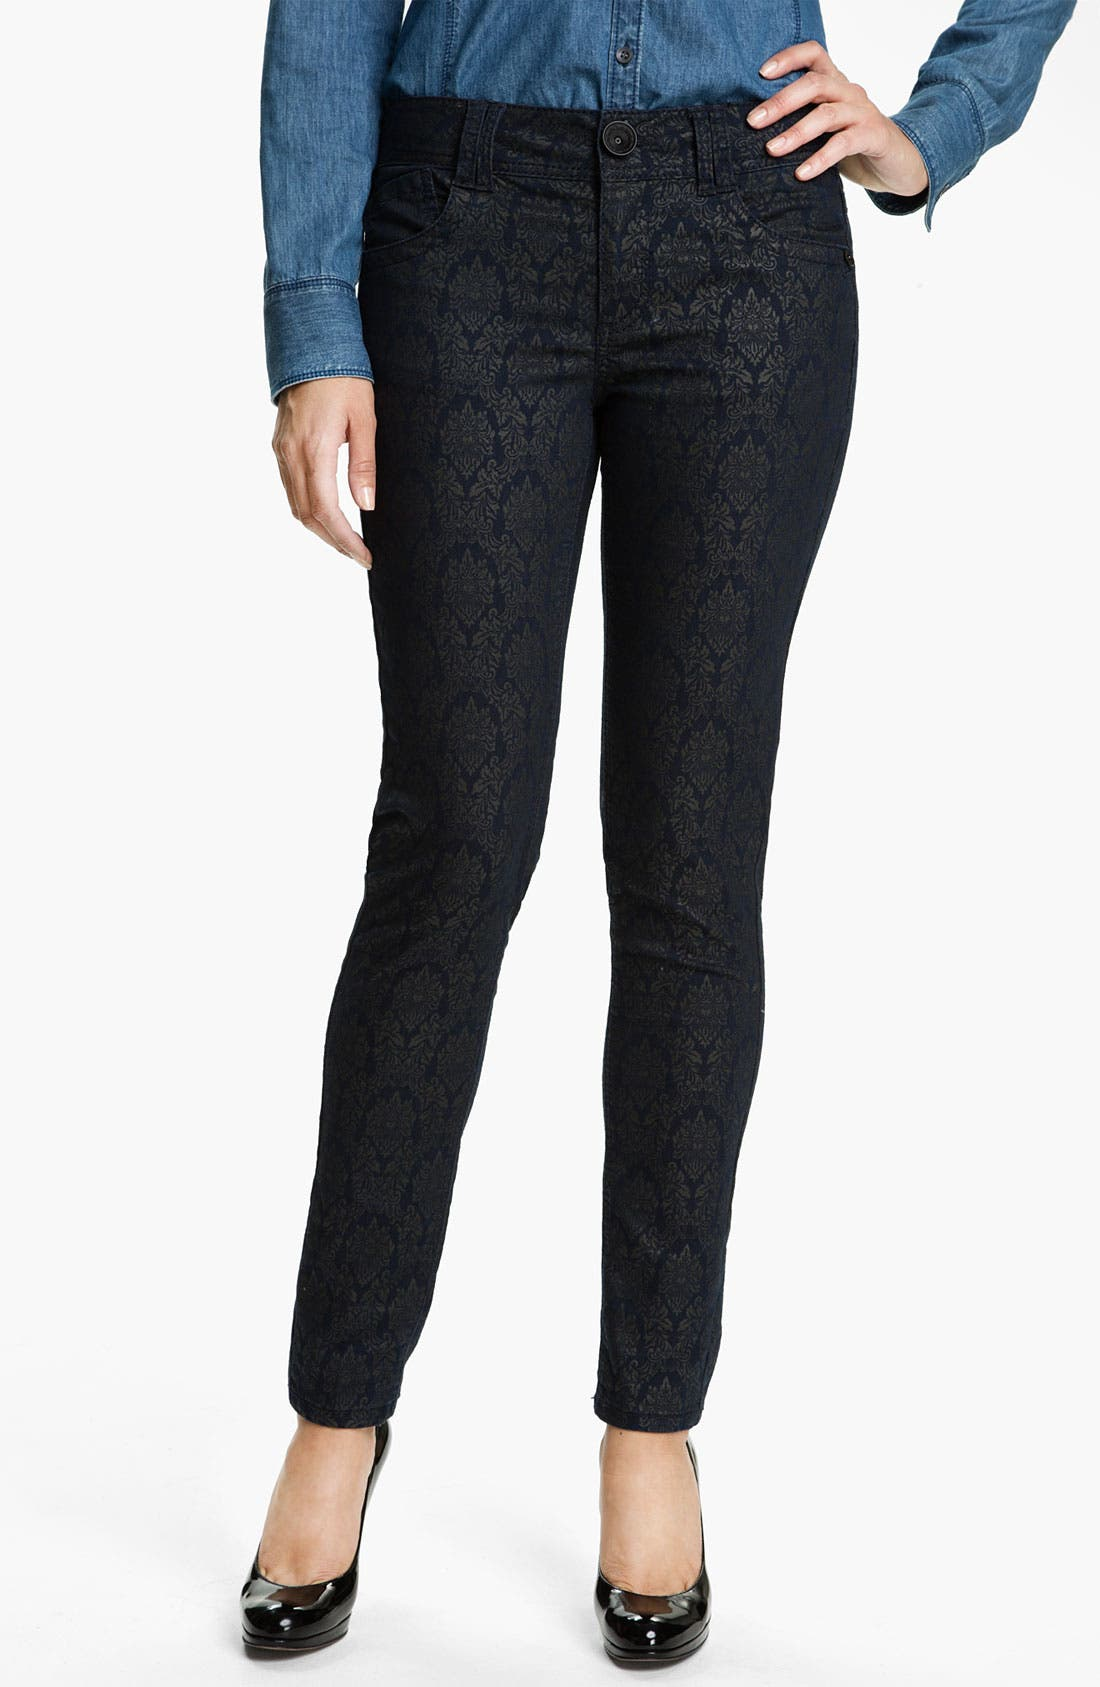 Main Image - Wit & Wisdom Brocade Print Skinny Jeans (Indigo) (Nordstrom Exclusive)